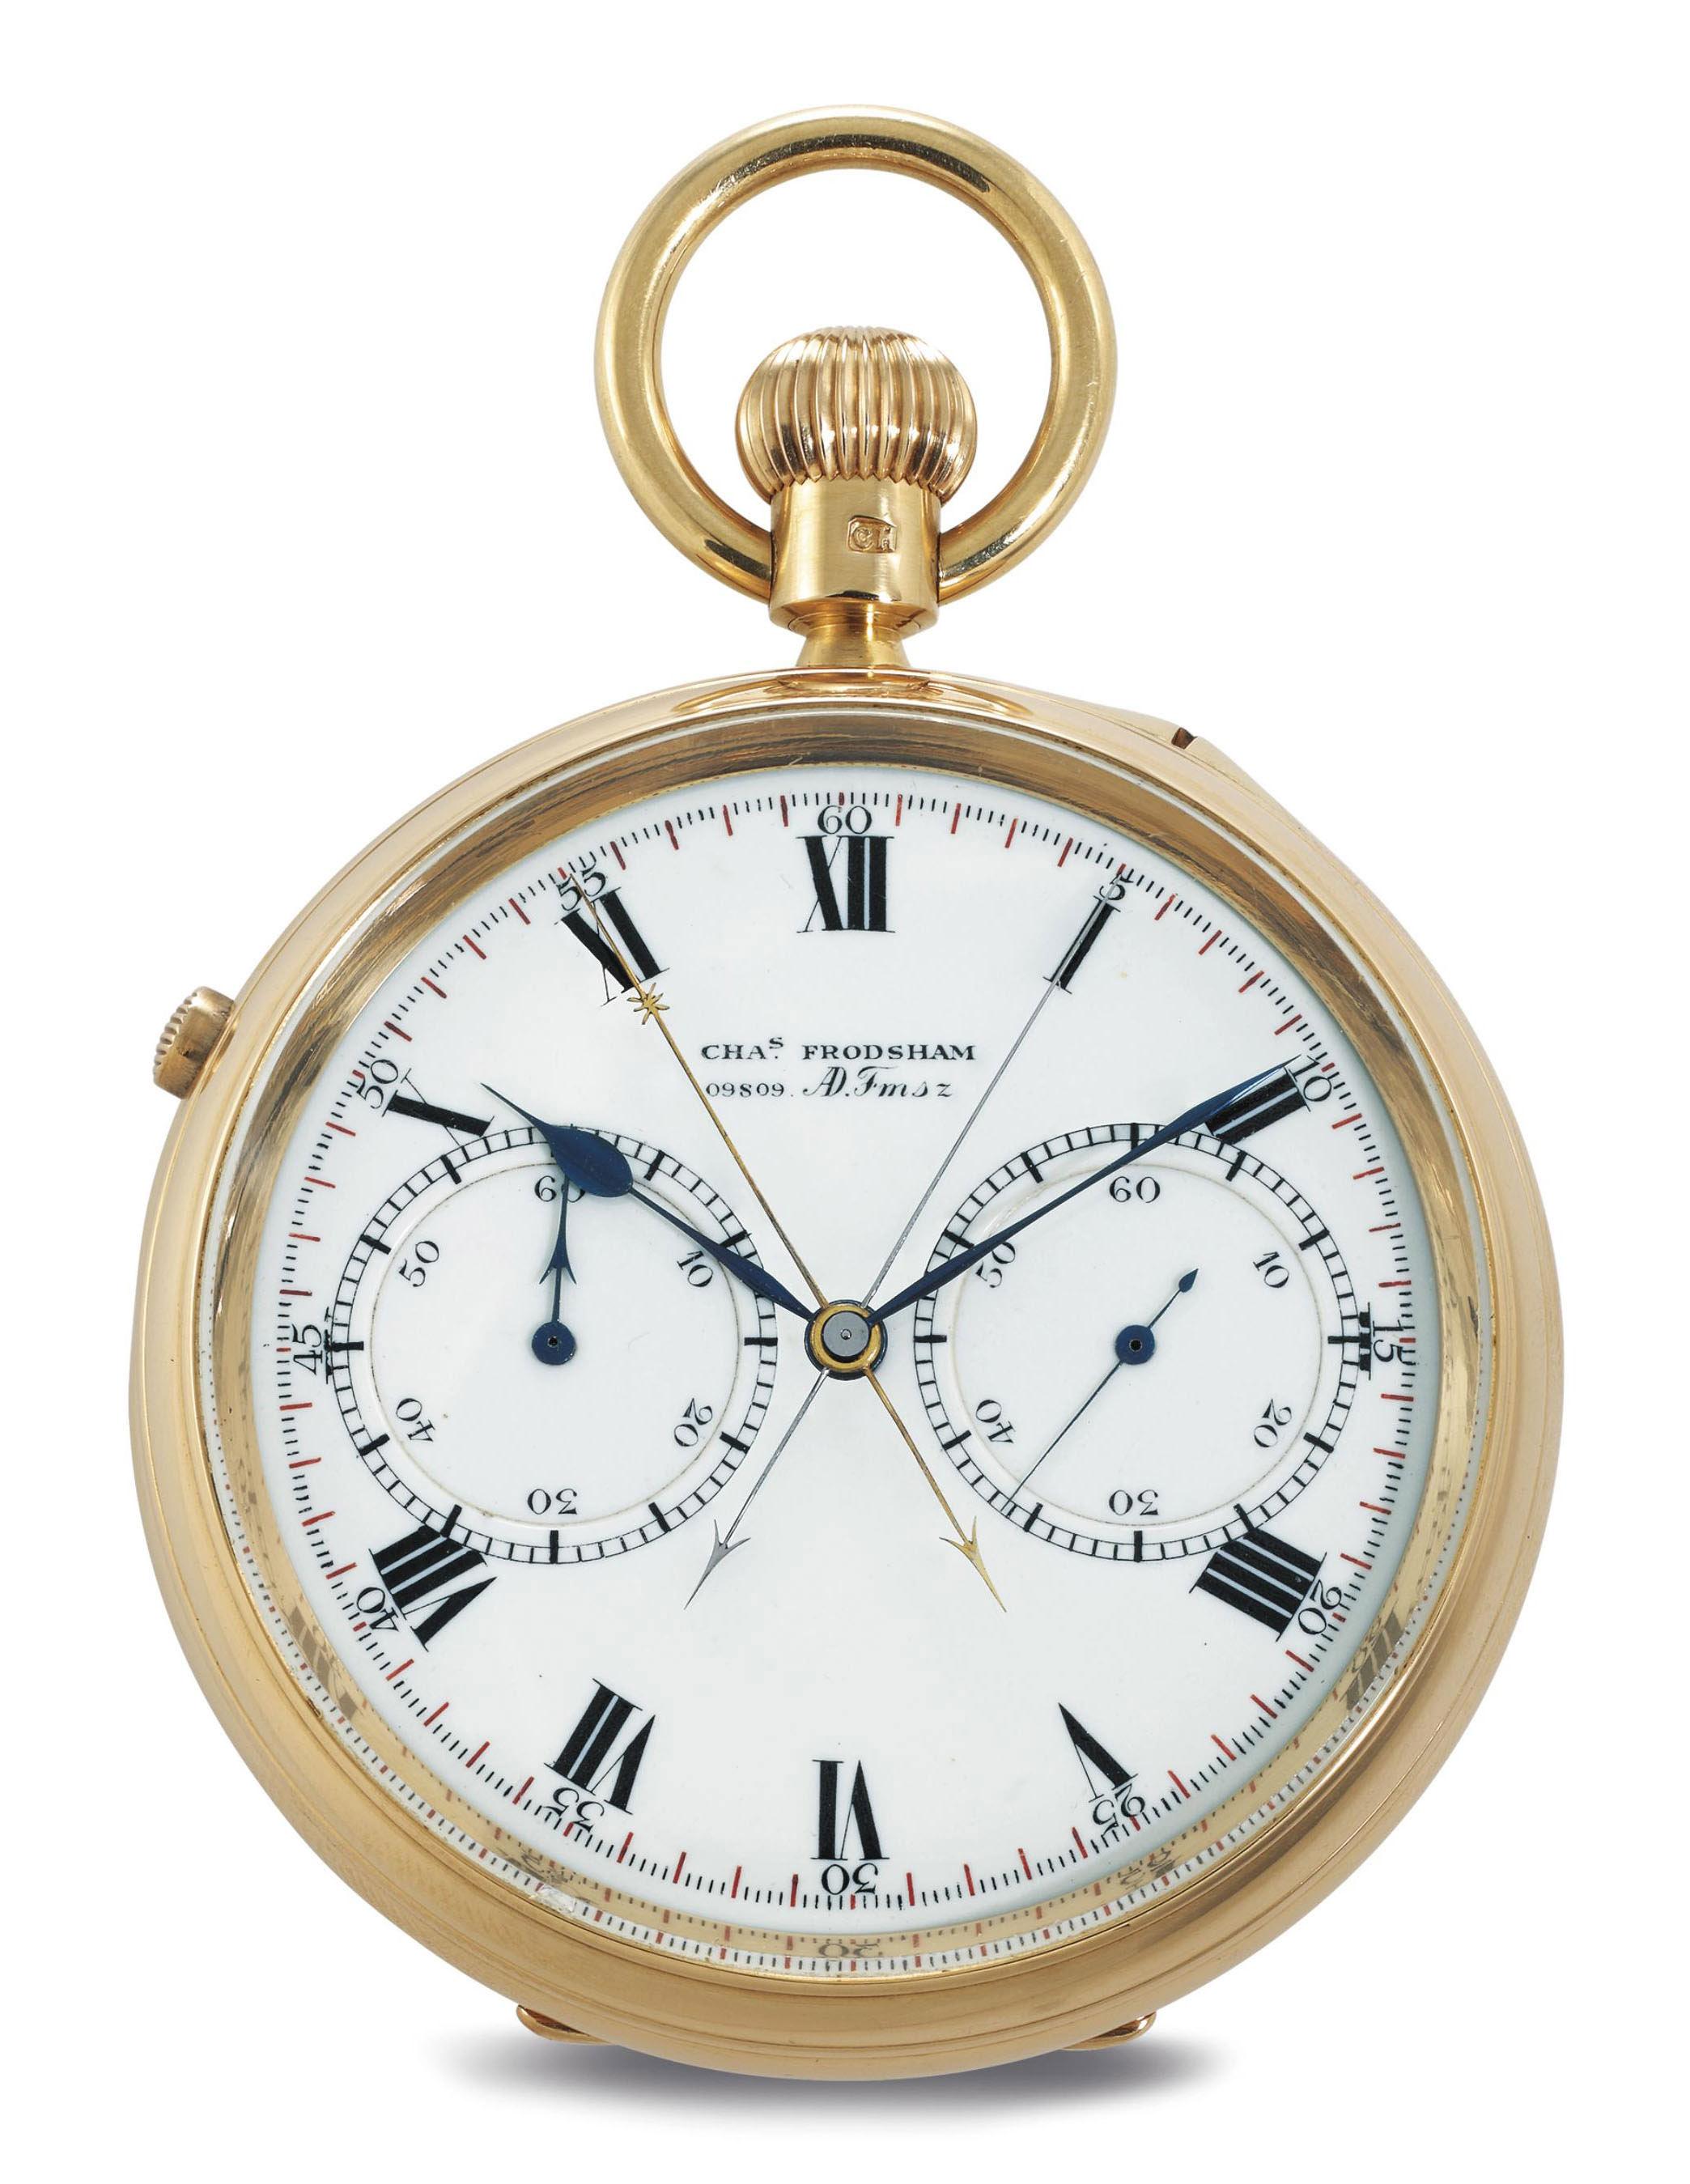 CHARLES FRODSHAM.  A FINE 18K GOLD OPENFACE SPLIT-SECONDS CHRONOGRAPH KEYLESS LEVER POCKET WATCH